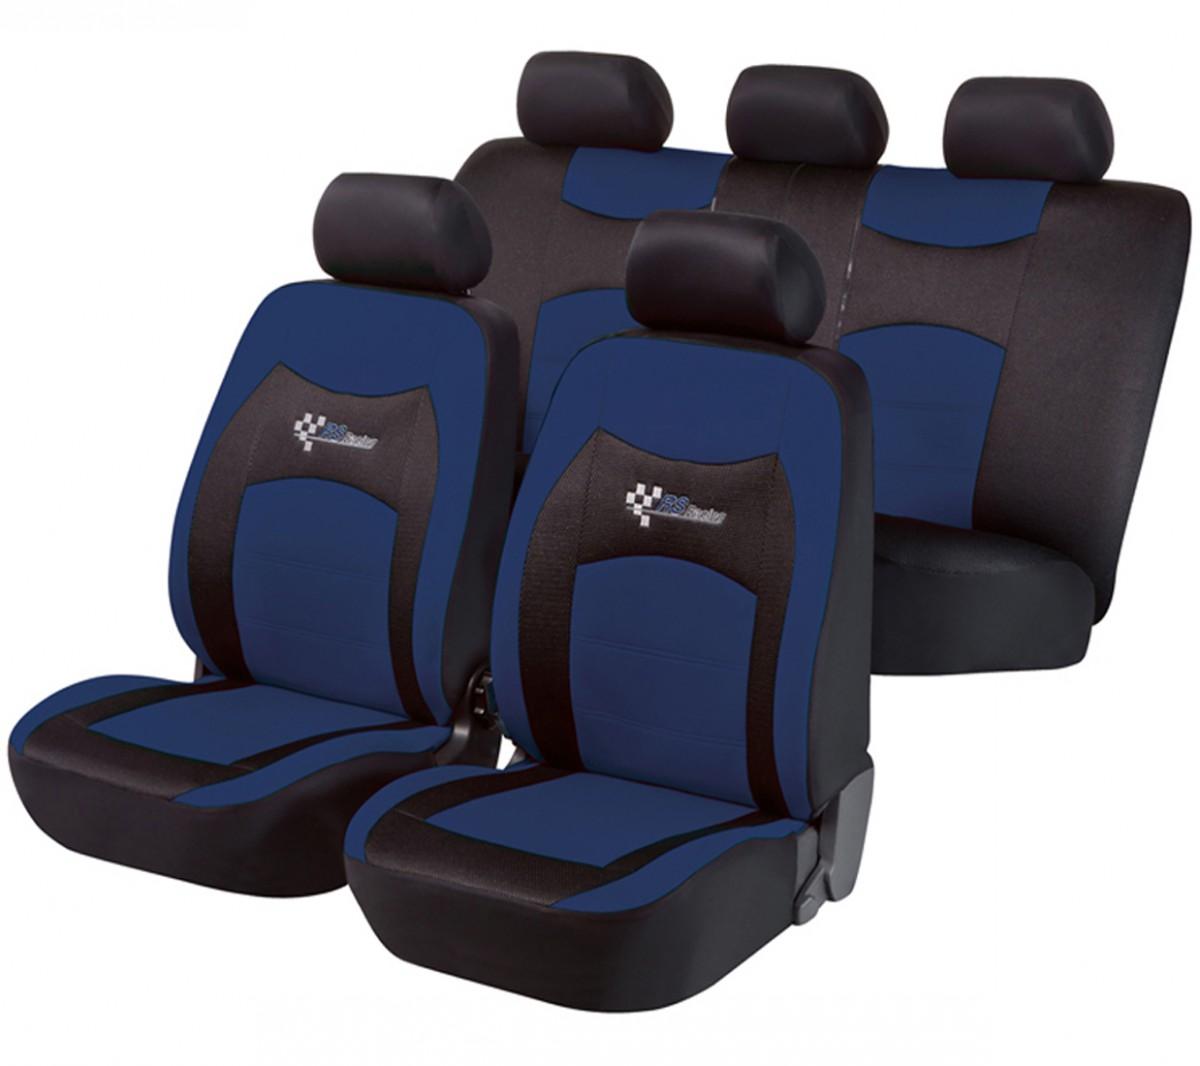 vw volkswagen lupo autositzbez ge schonbez ge gepr fte. Black Bedroom Furniture Sets. Home Design Ideas